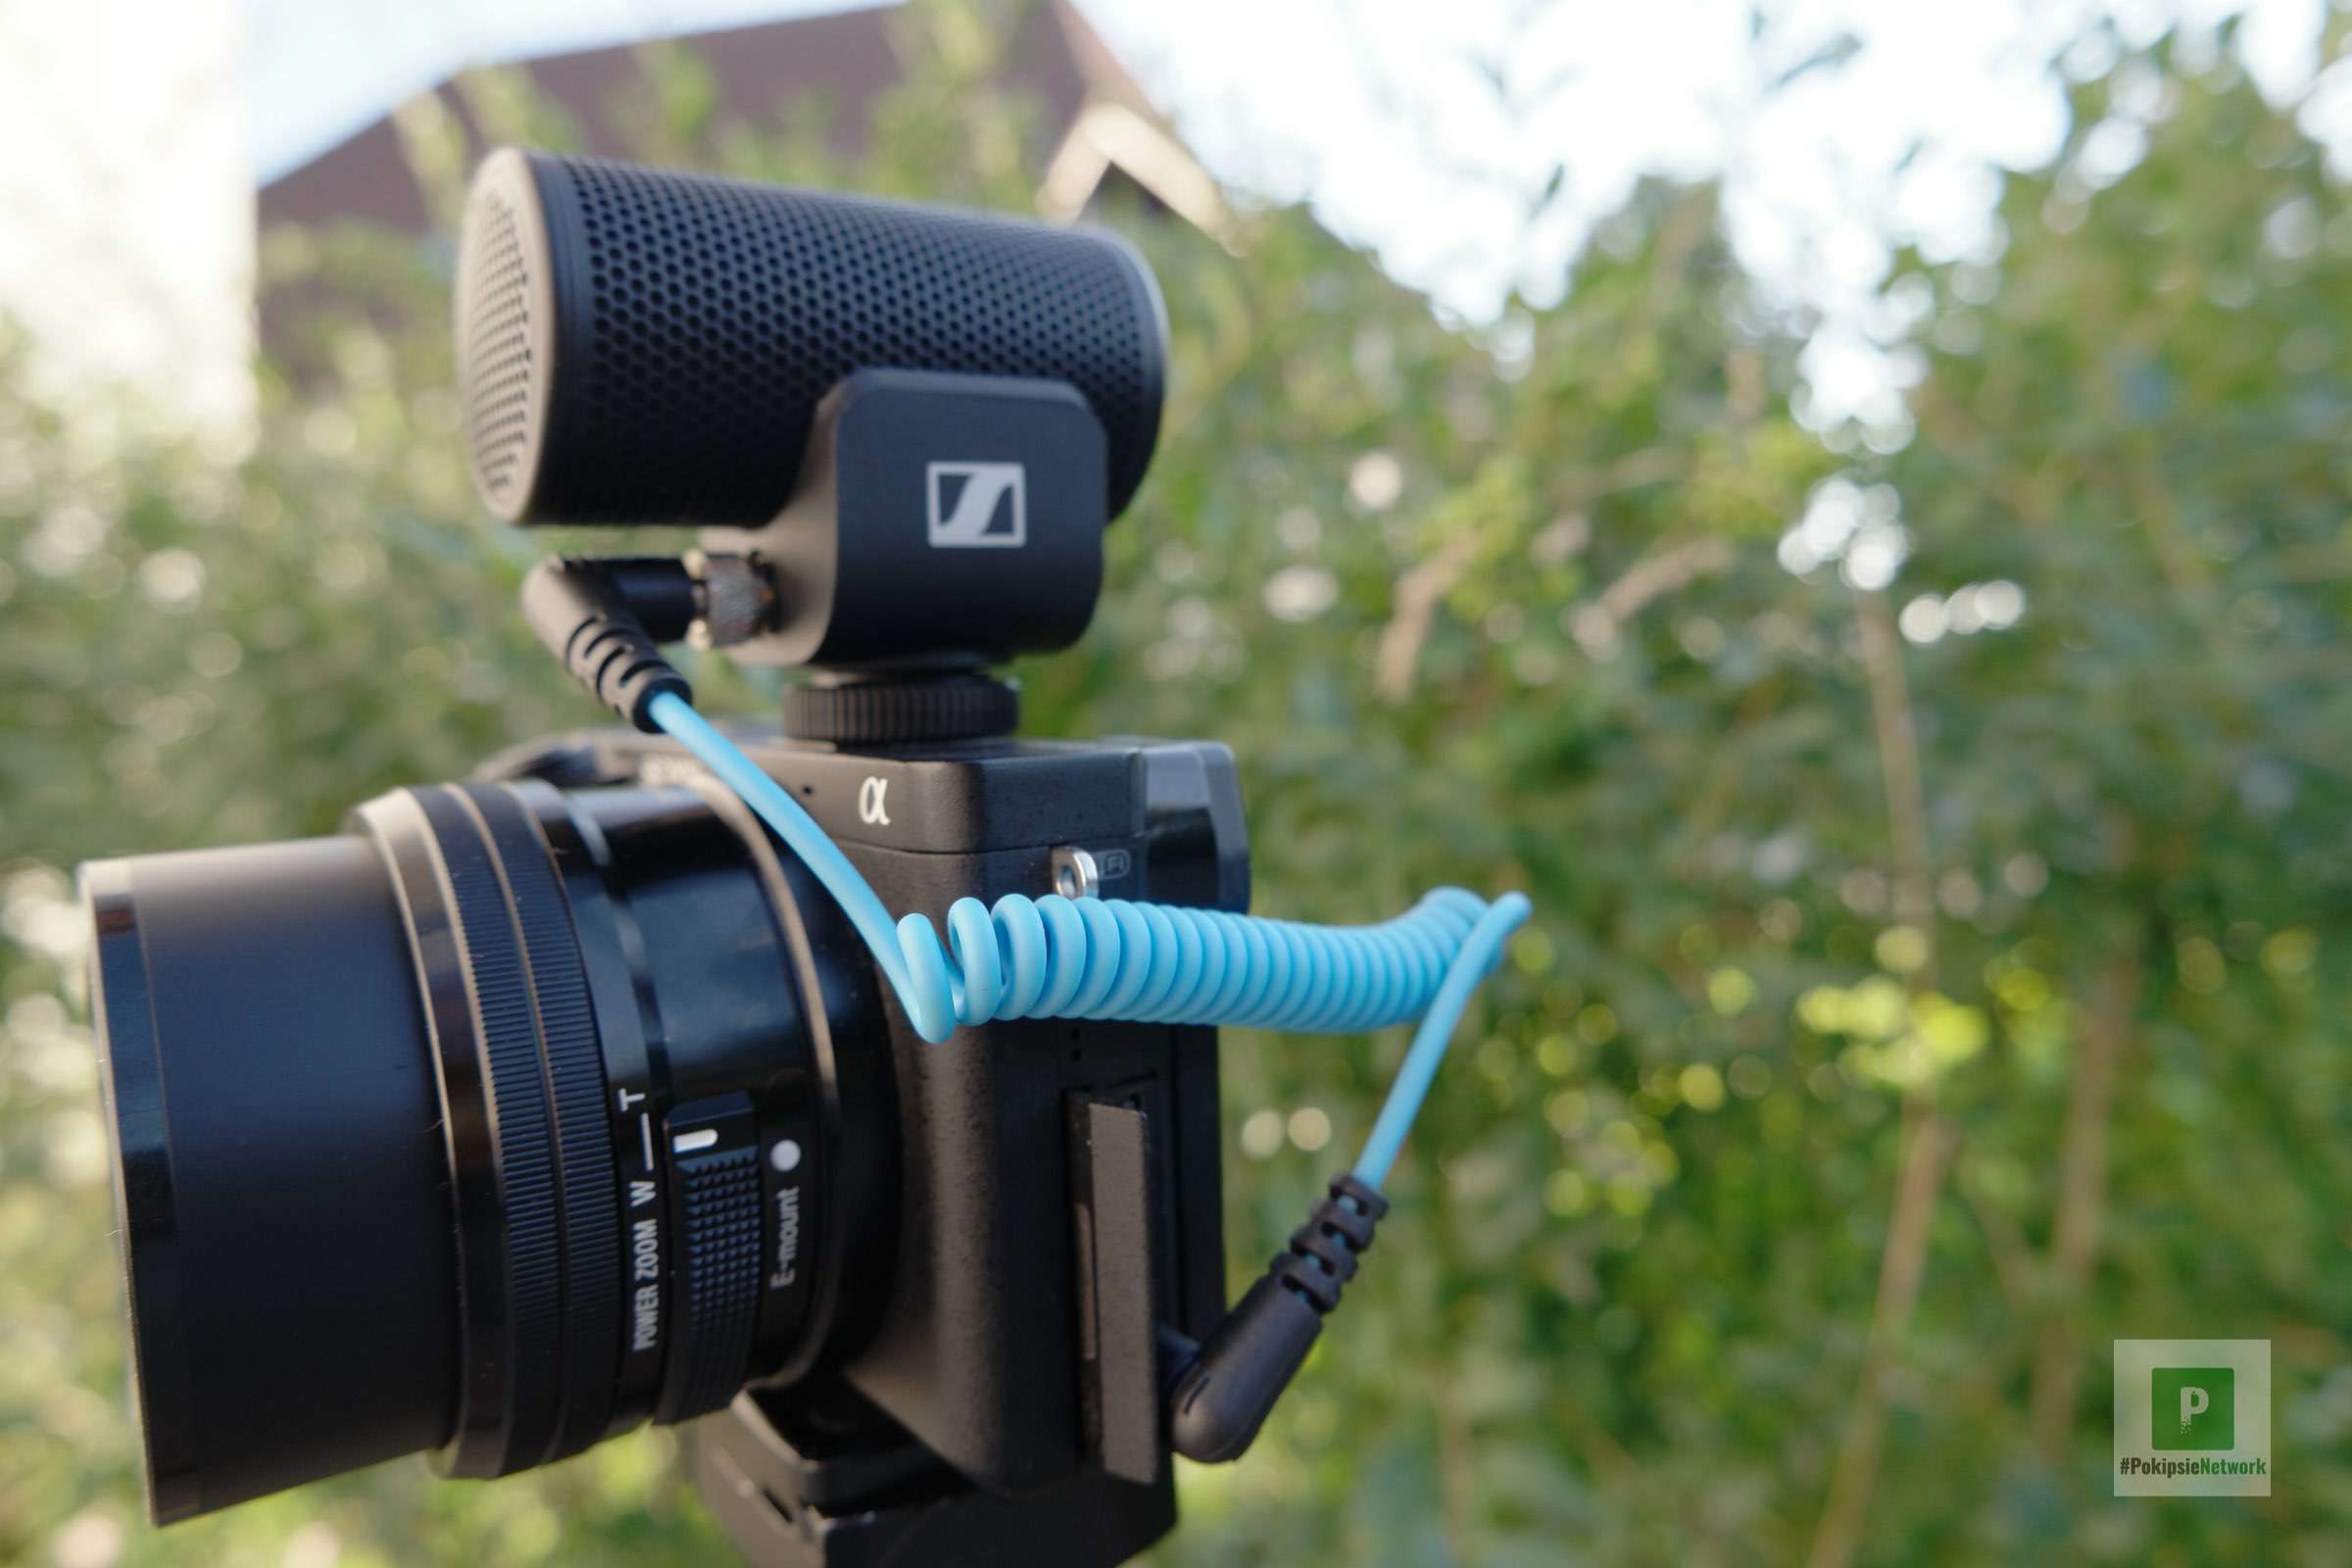 Mikrofon mit Kamera verbinden